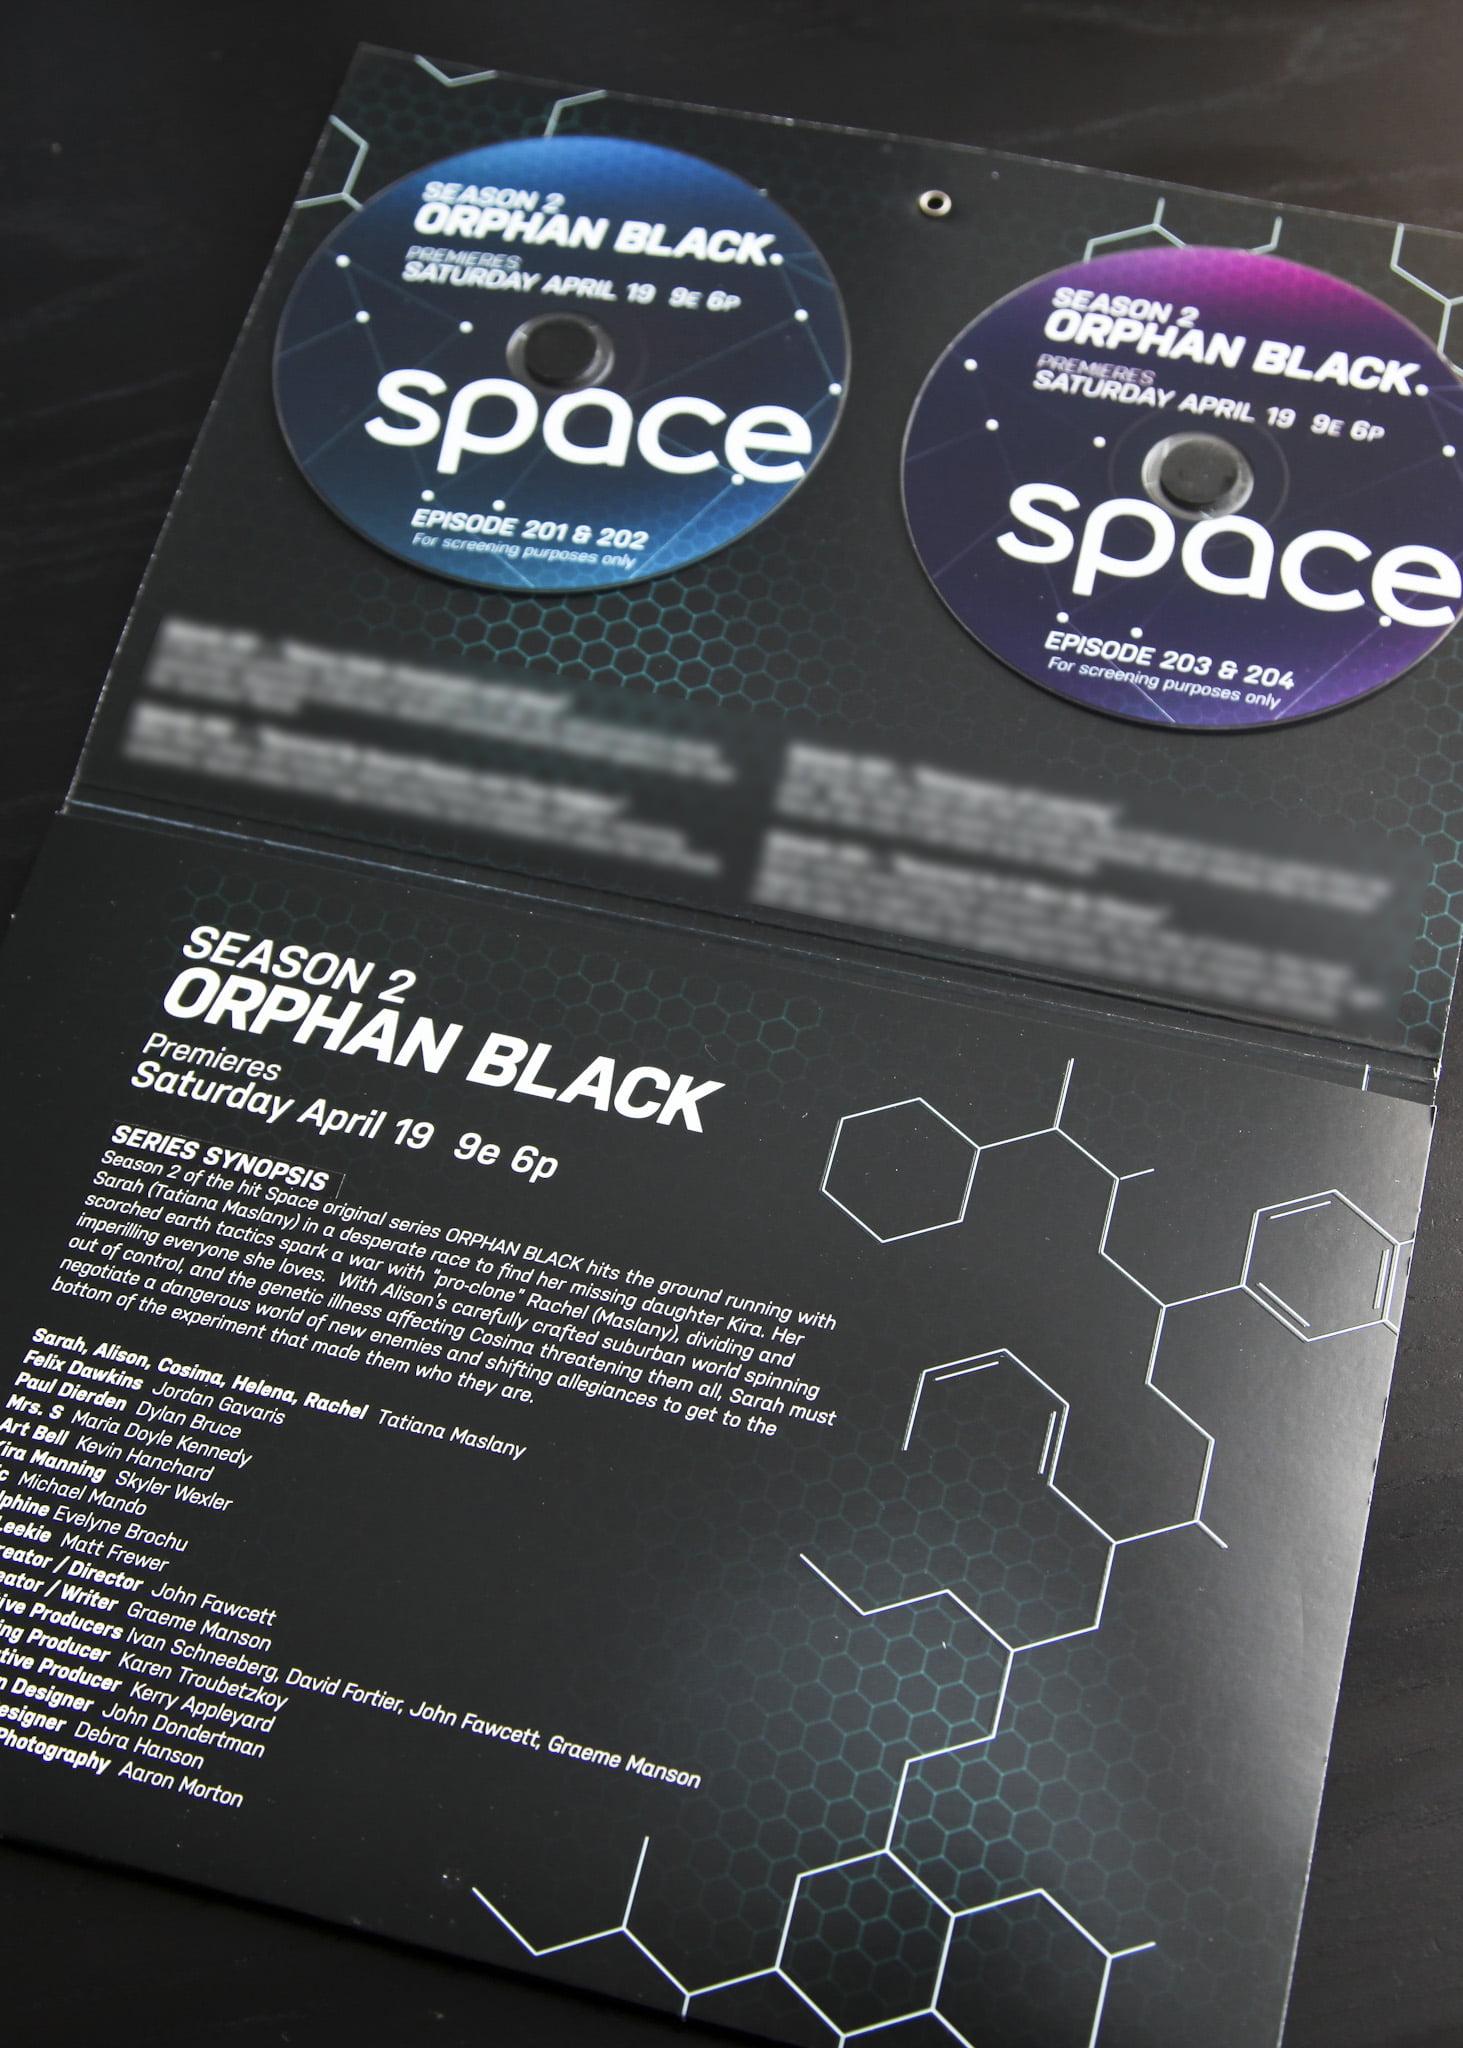 Orphan Black press kit - inside